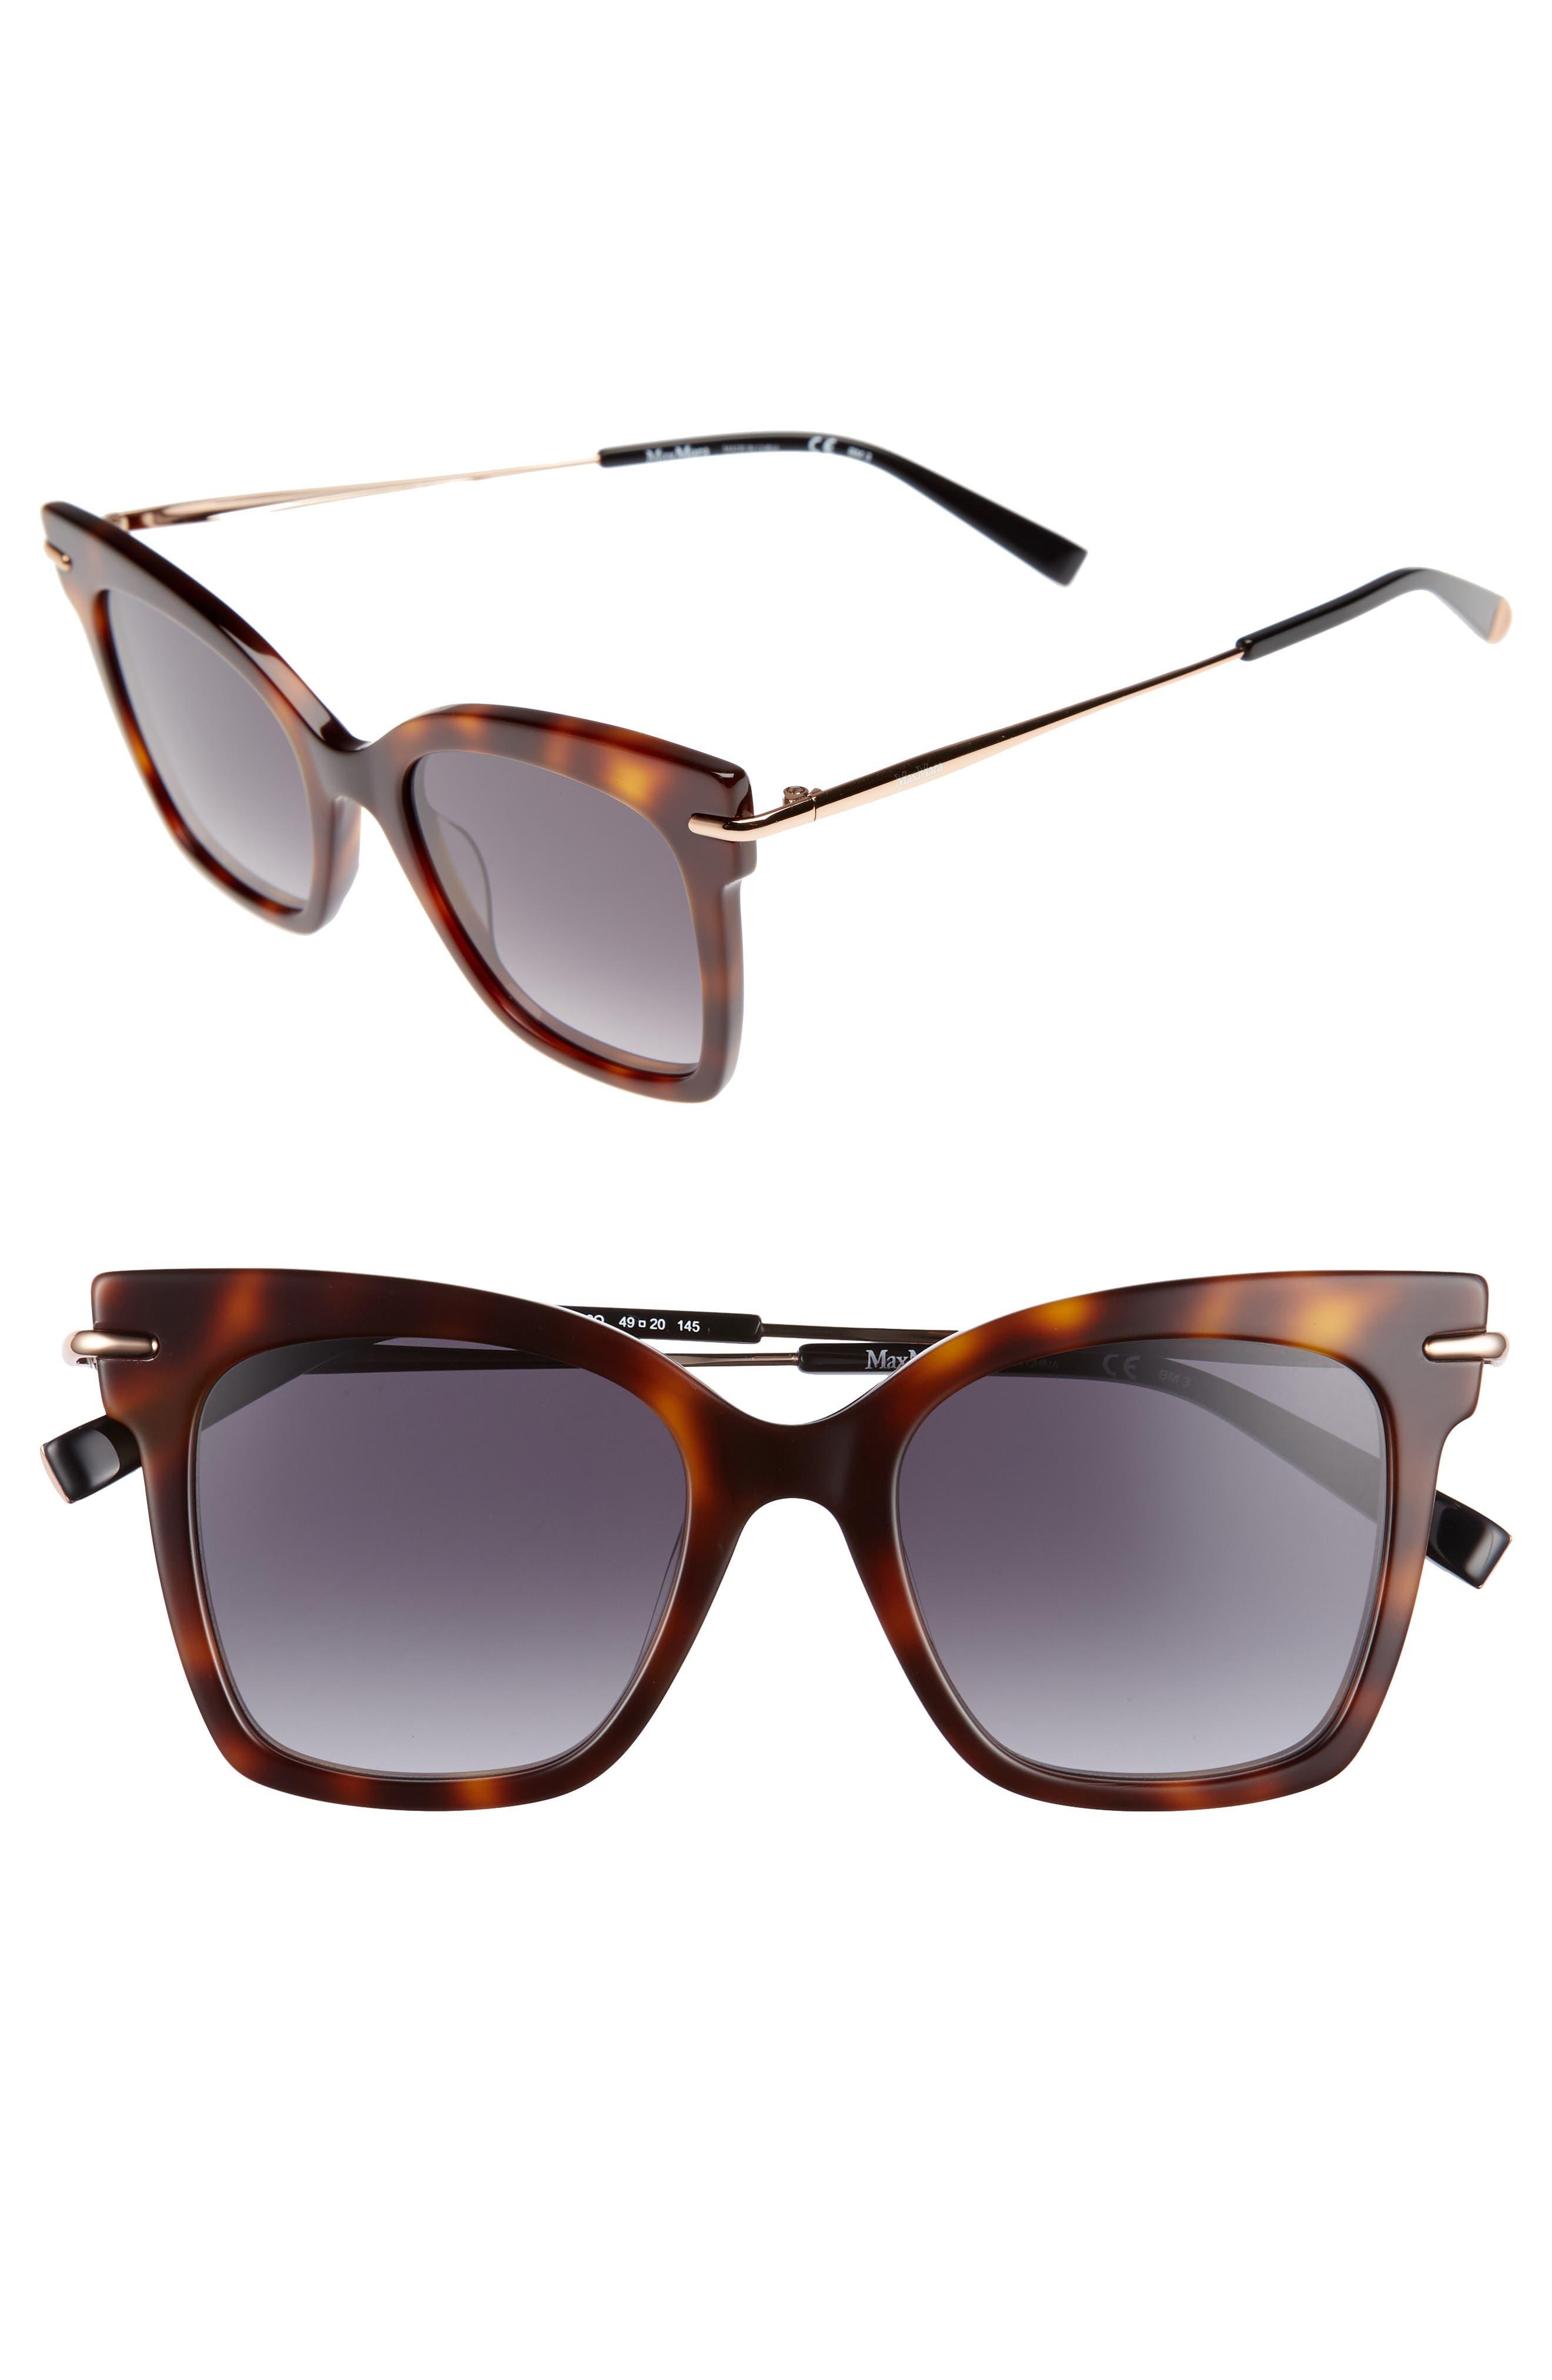 Needliv 49mm Gradient Cat Eye Sunglasses,                             Main thumbnail 1, color,                             001